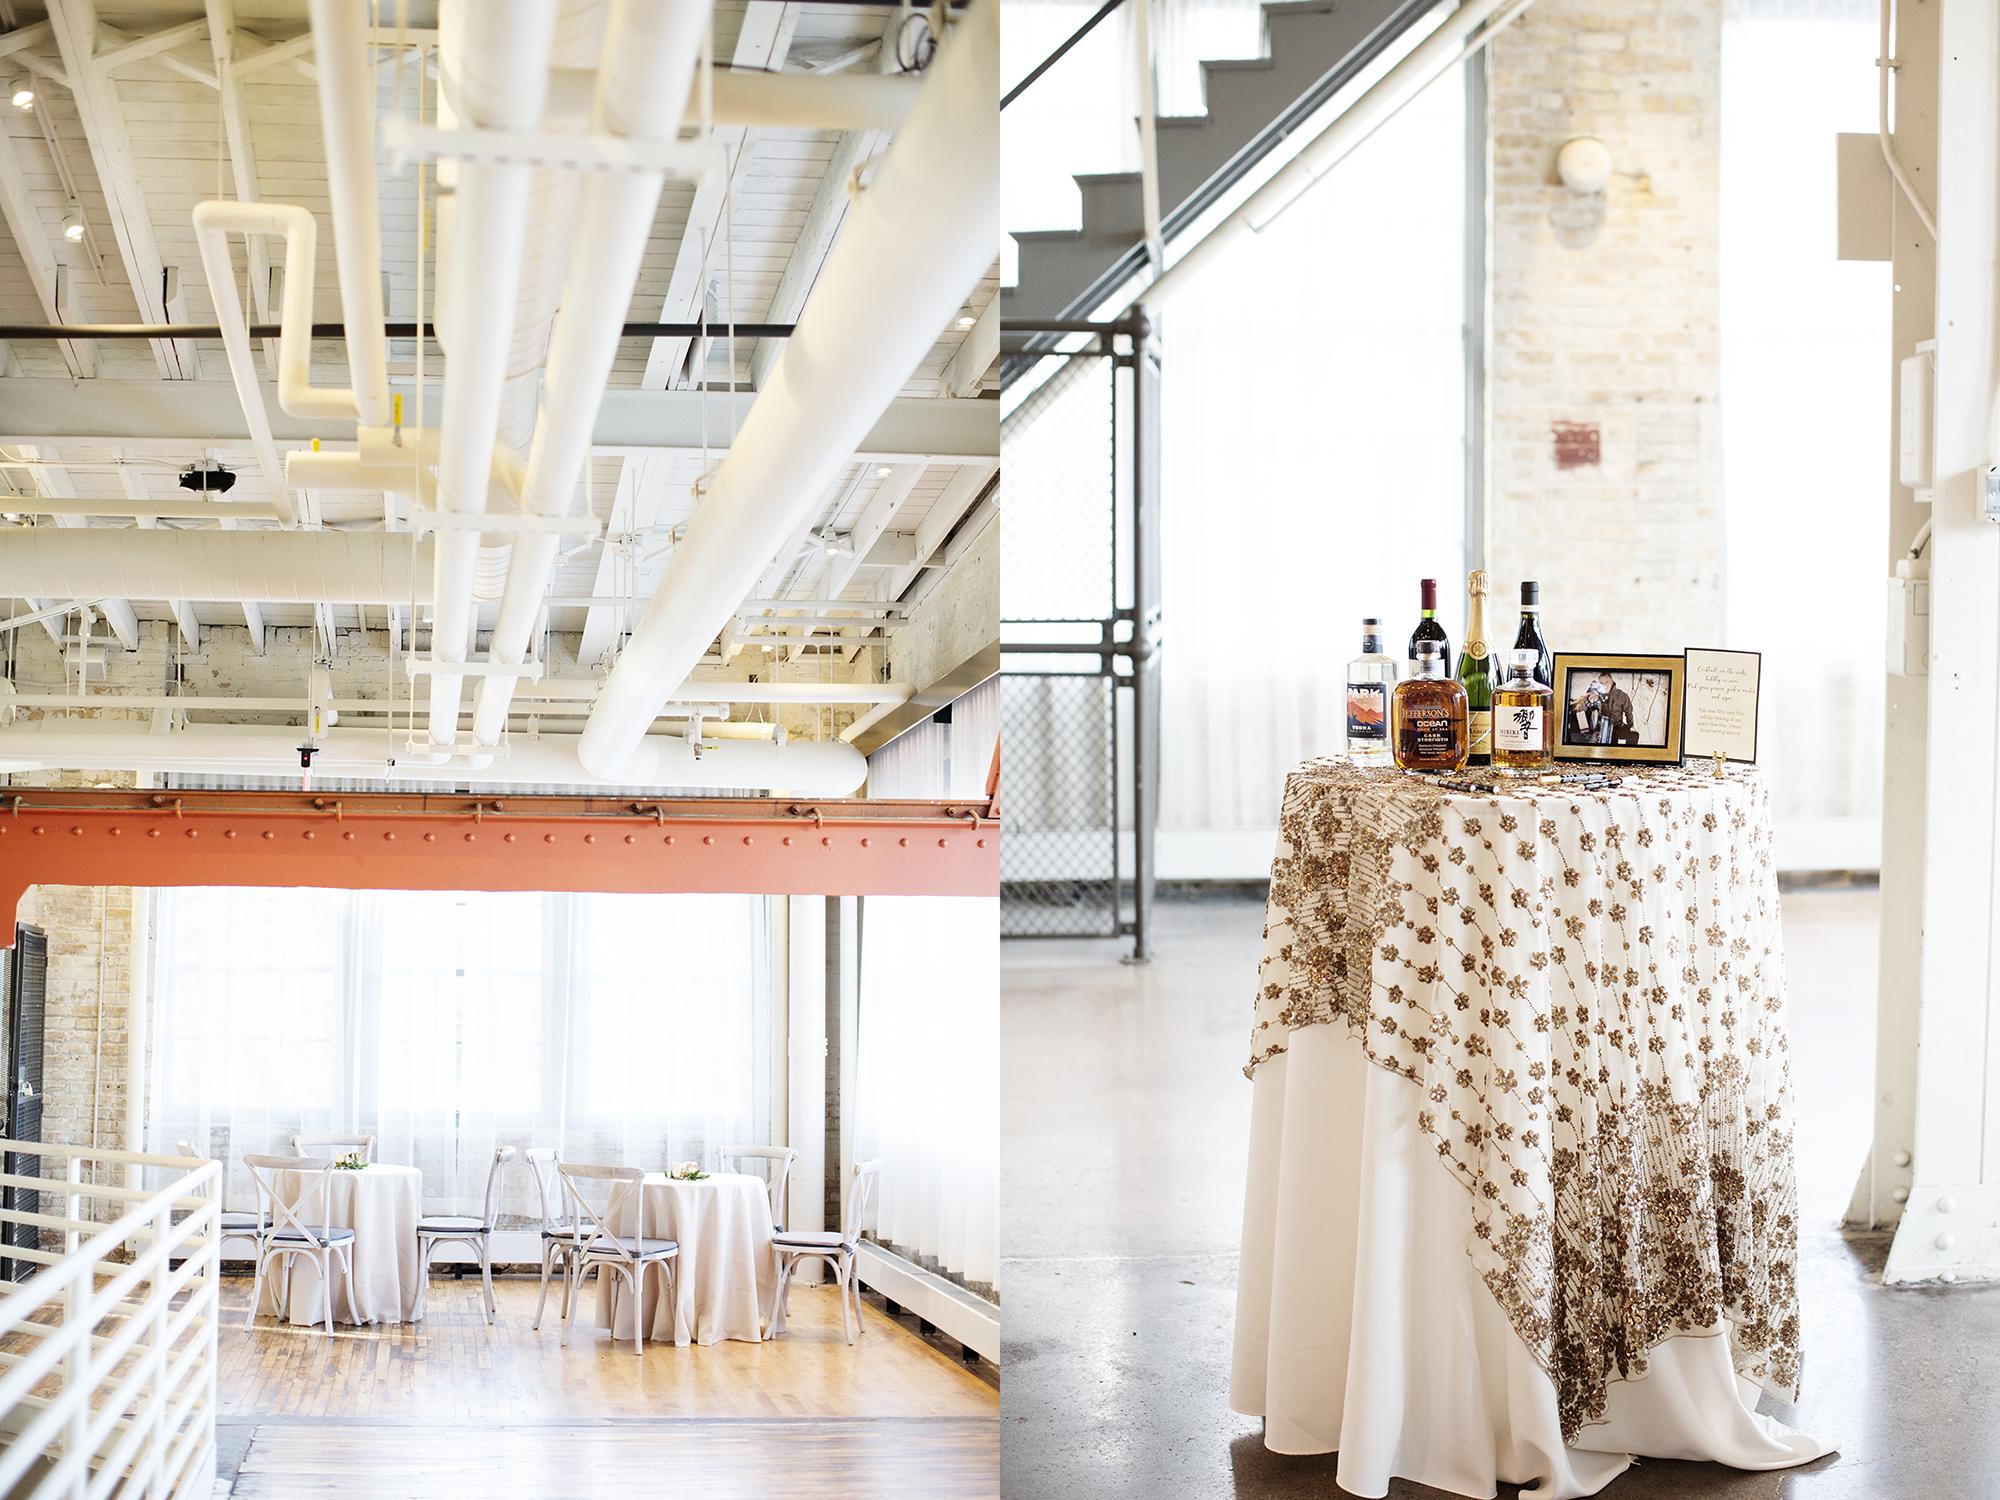 Machine Shop Wedding Photos | Photography by Photogen Inc. | Eliesa Johnson | Based in Minneapolis, Minnesota